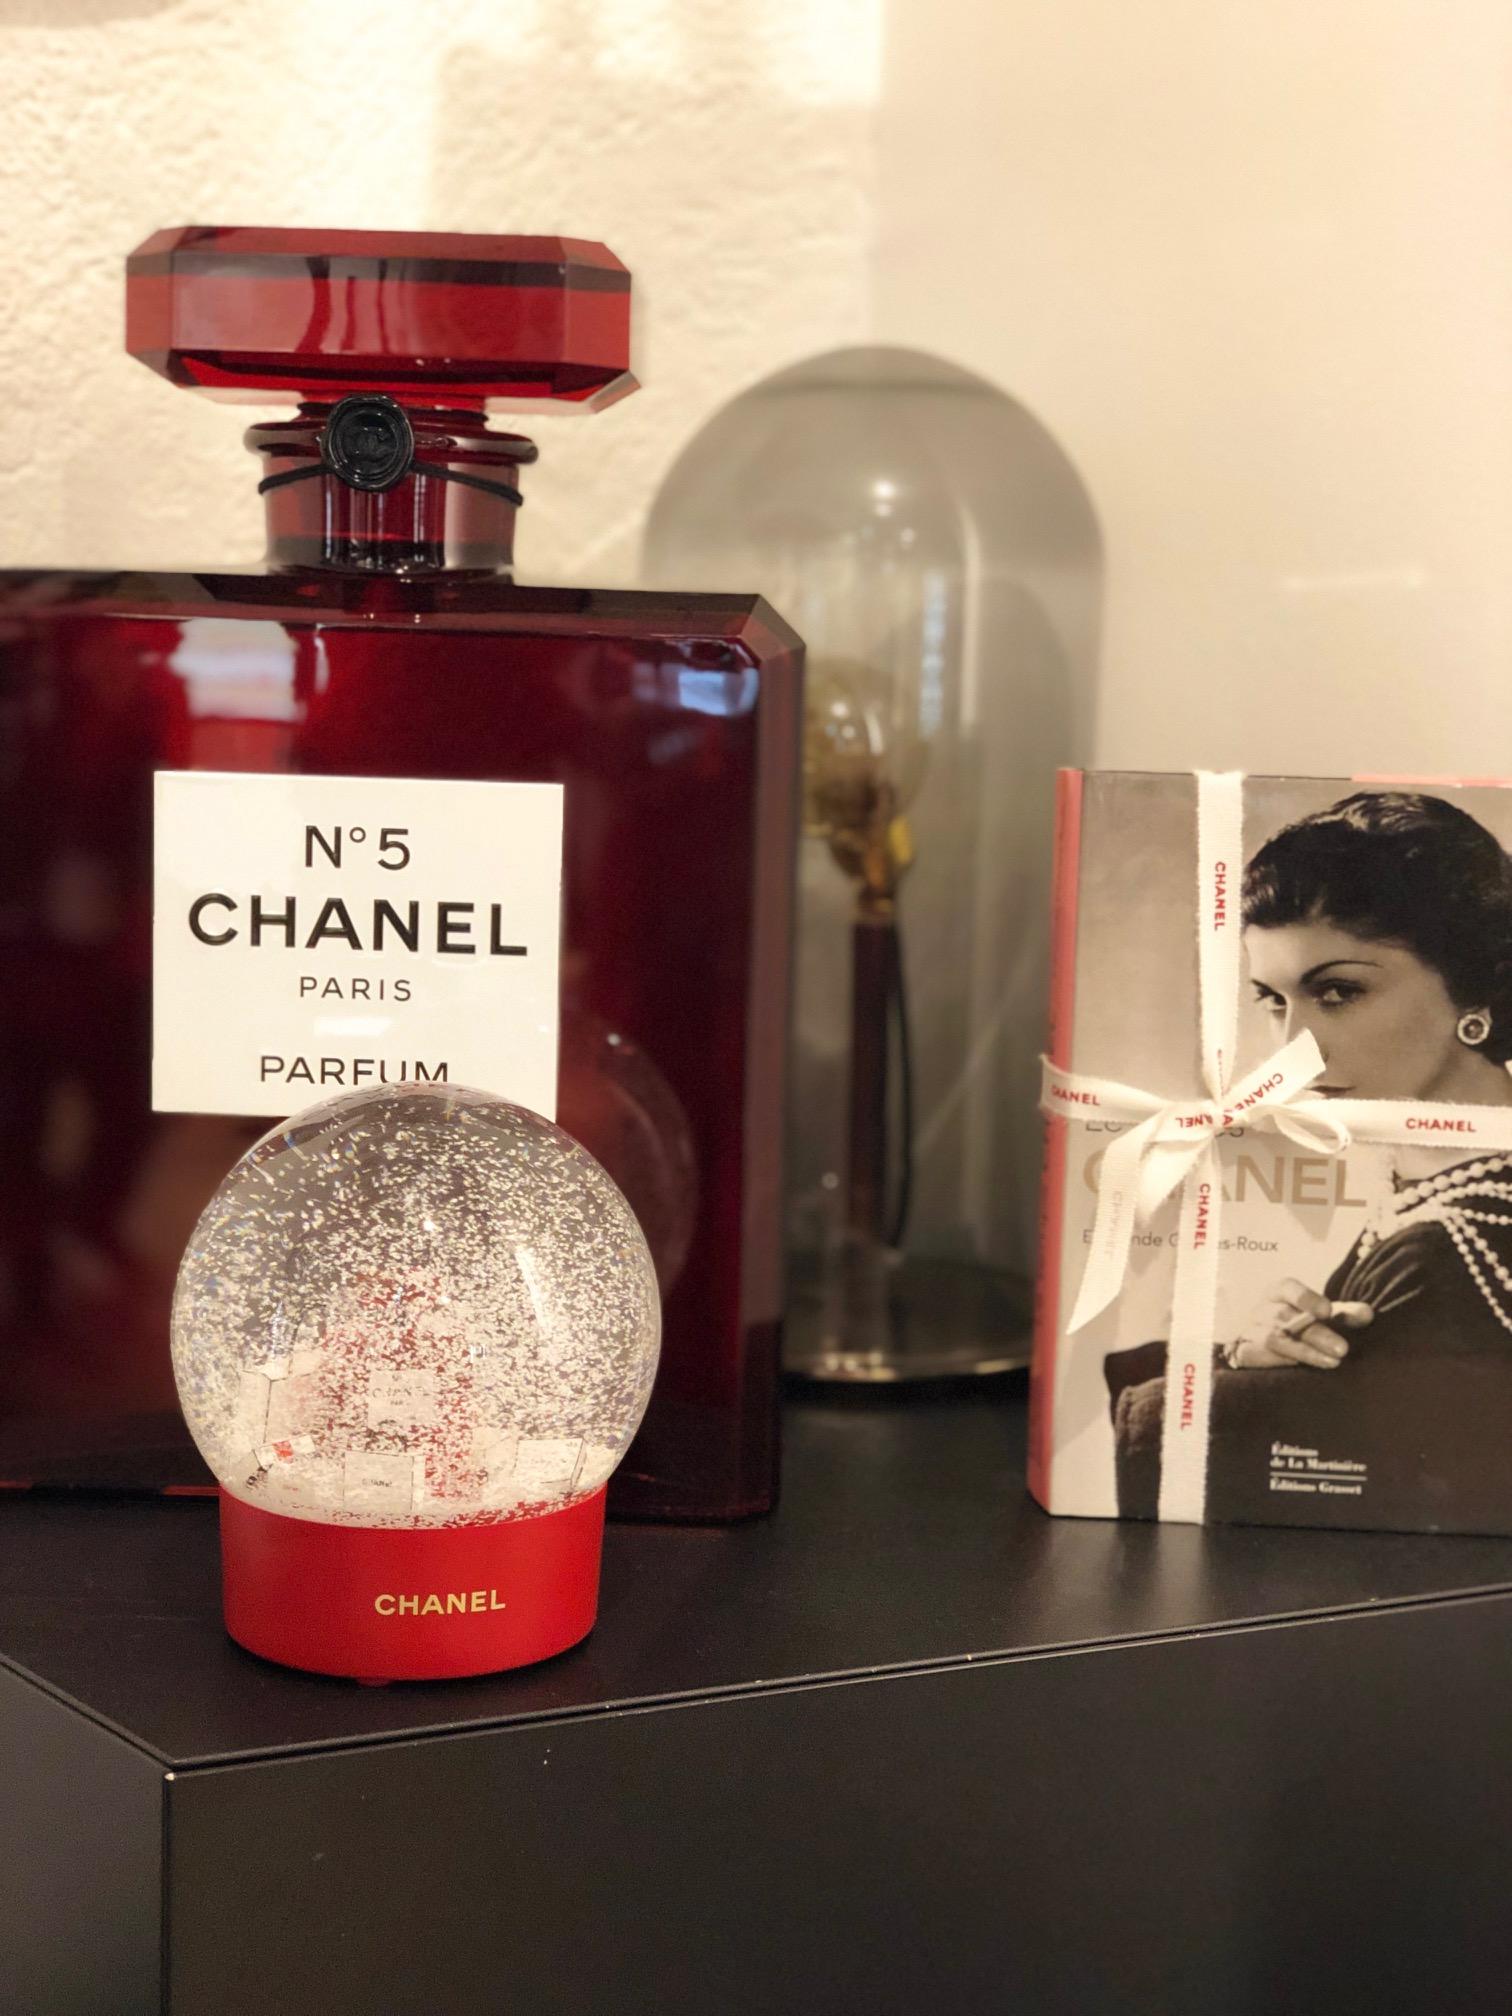 Chanel-le-rouge-elisa-les-bons-tuyaux-5.JPG